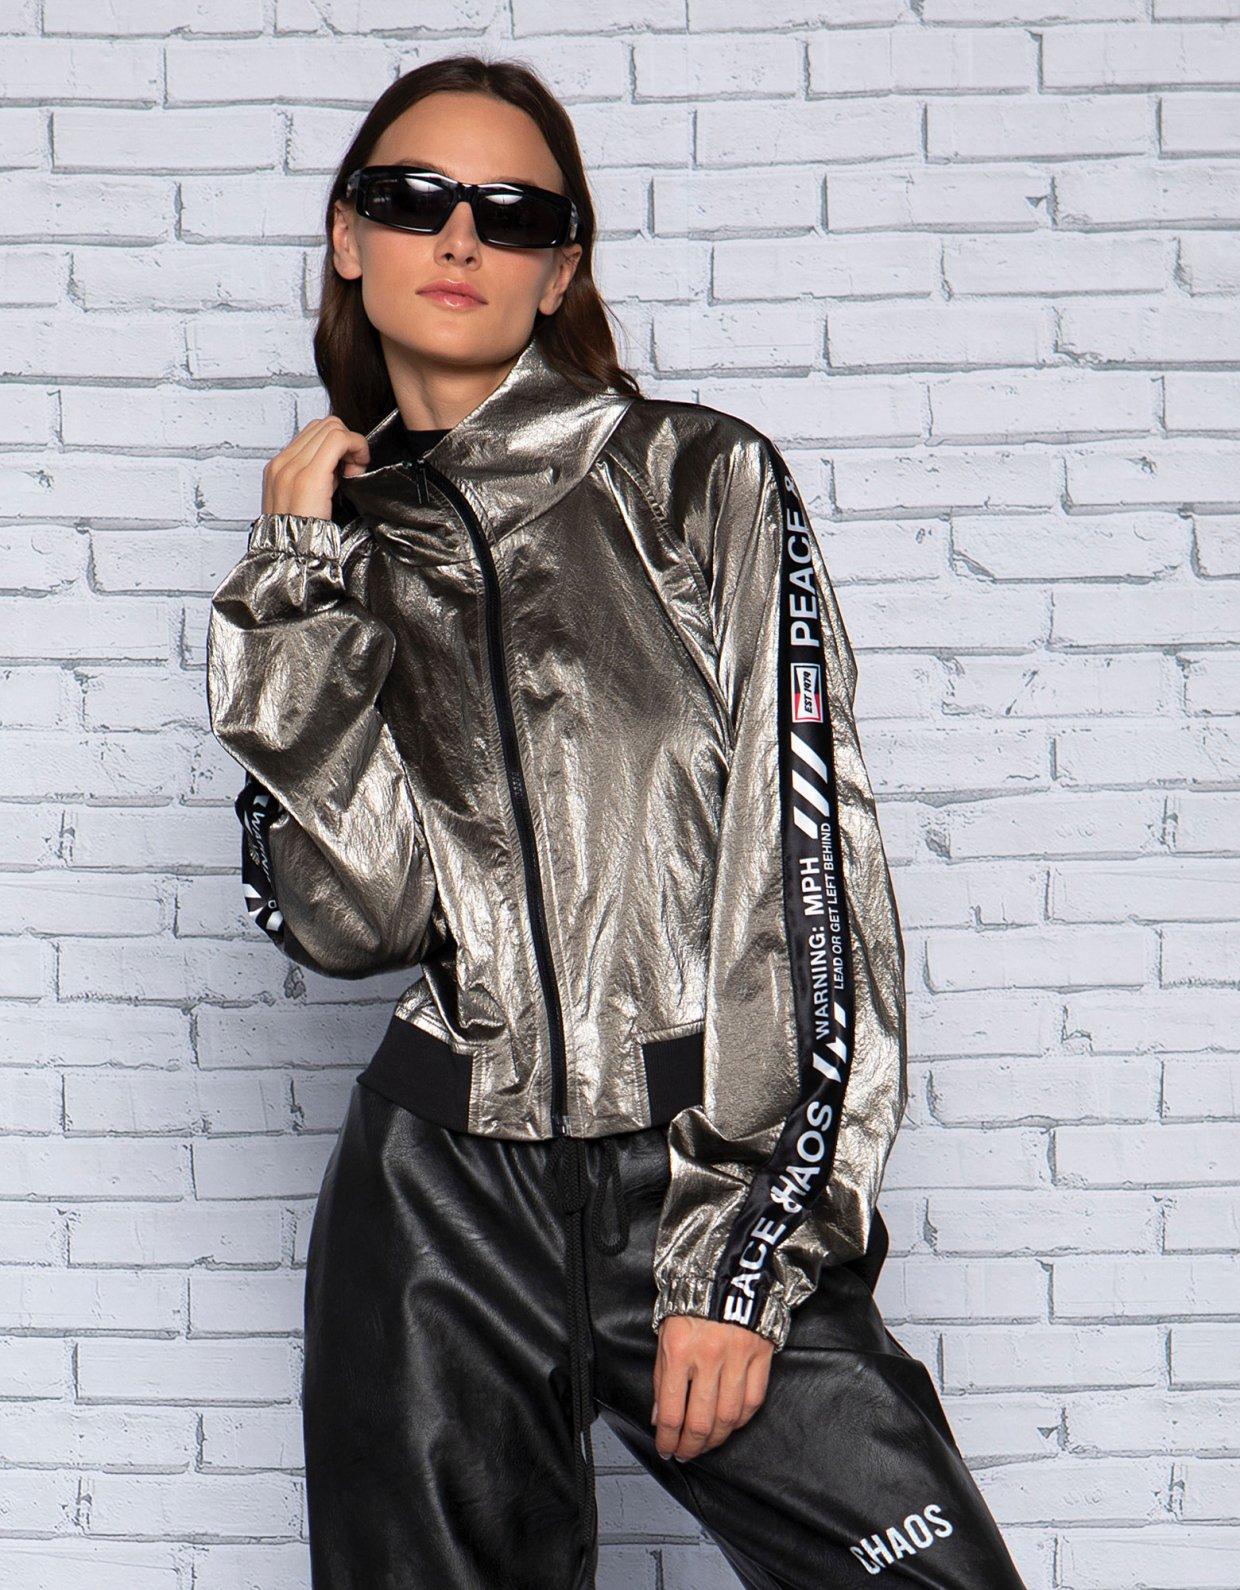 Peace & Chaos Metallic jacket